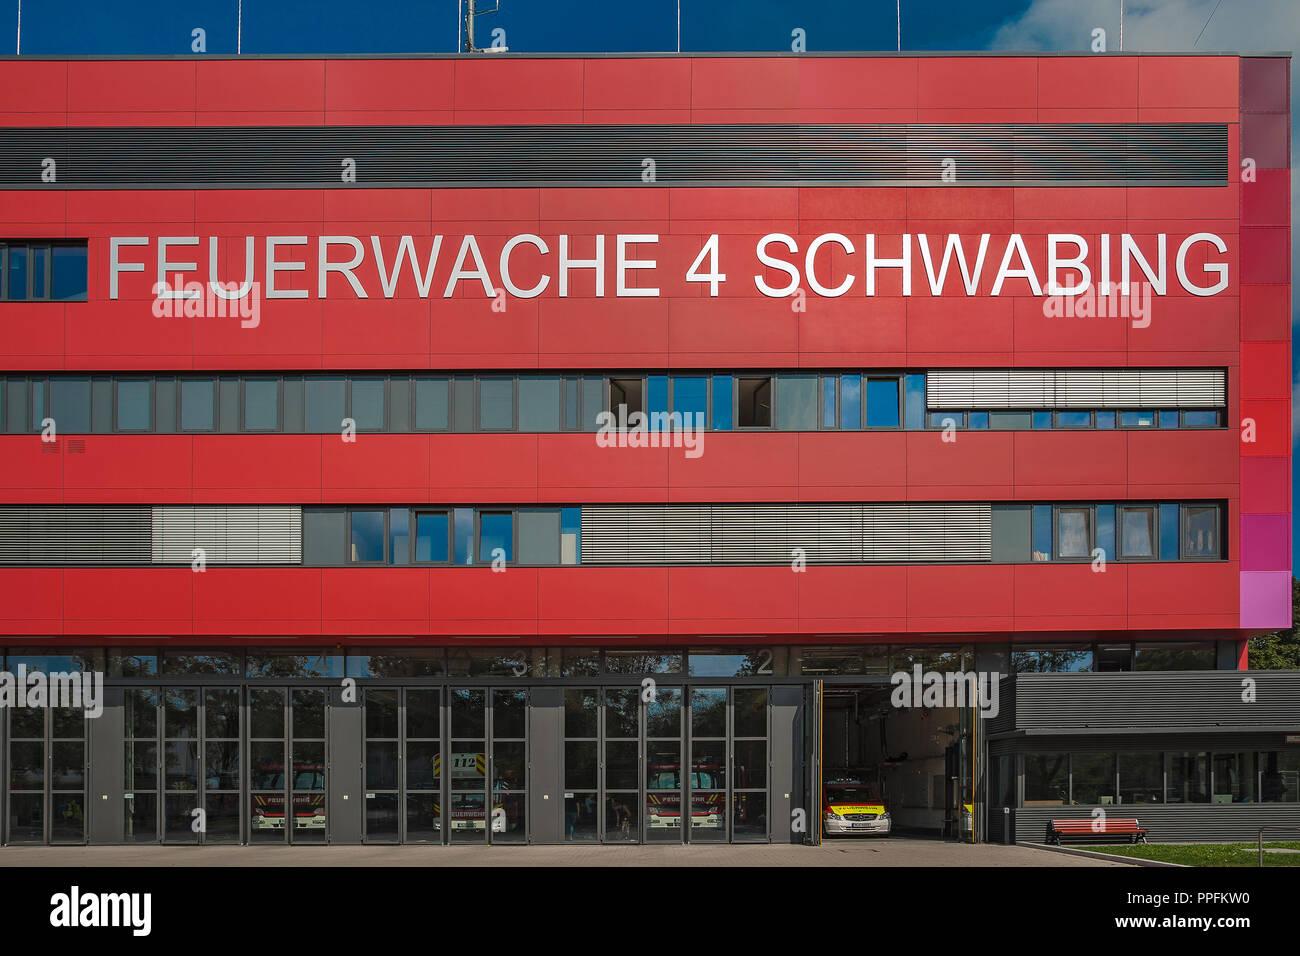 Fire Station 4, Schwabing, Munich, Upper Bavaria, Bavaria, Germany - Stock Image